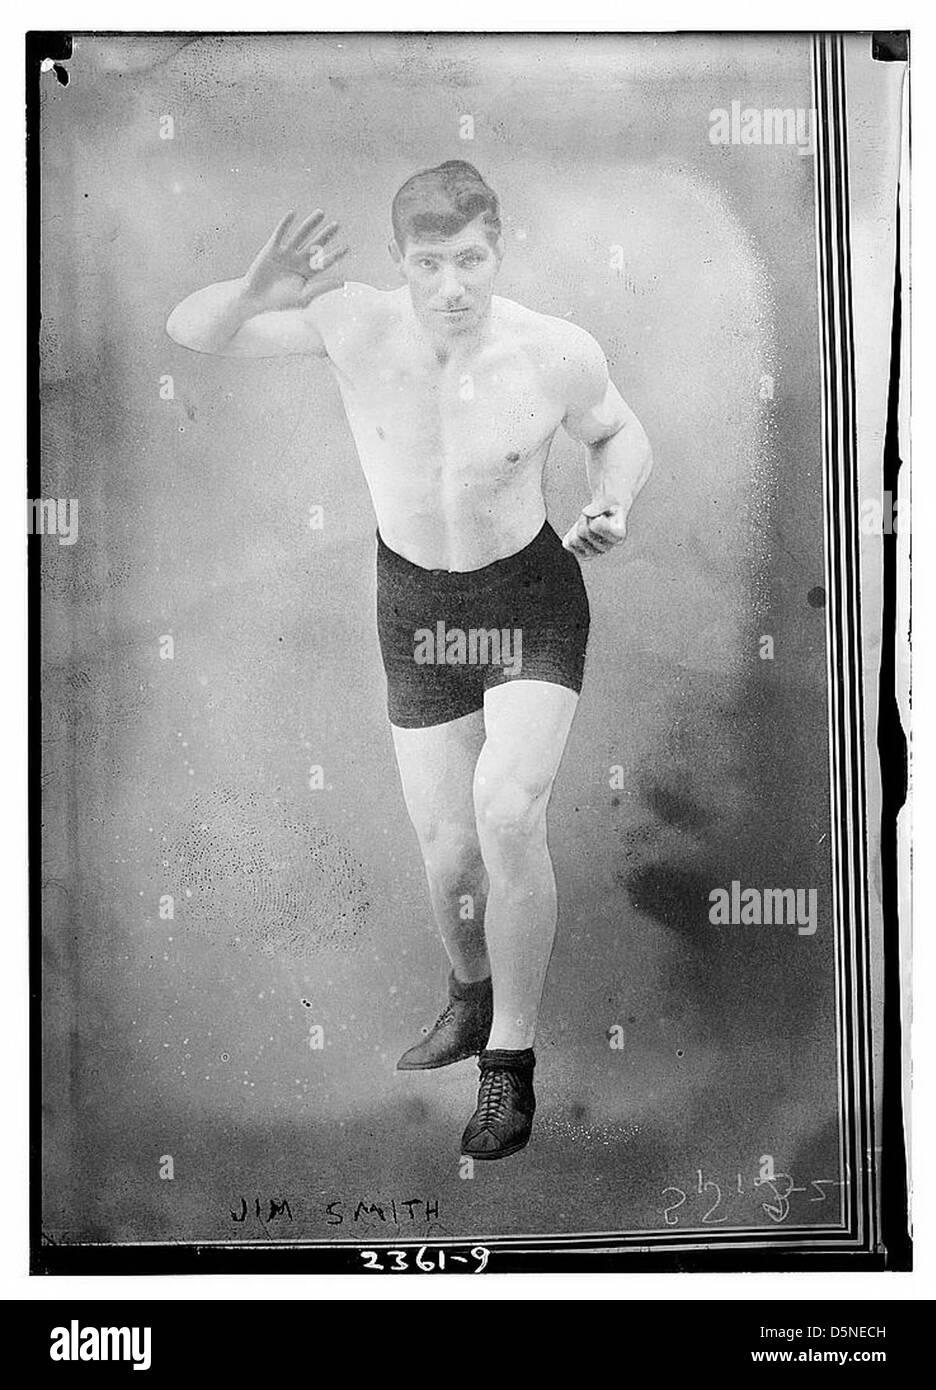 Jim Smith (LOC) - Stock Image